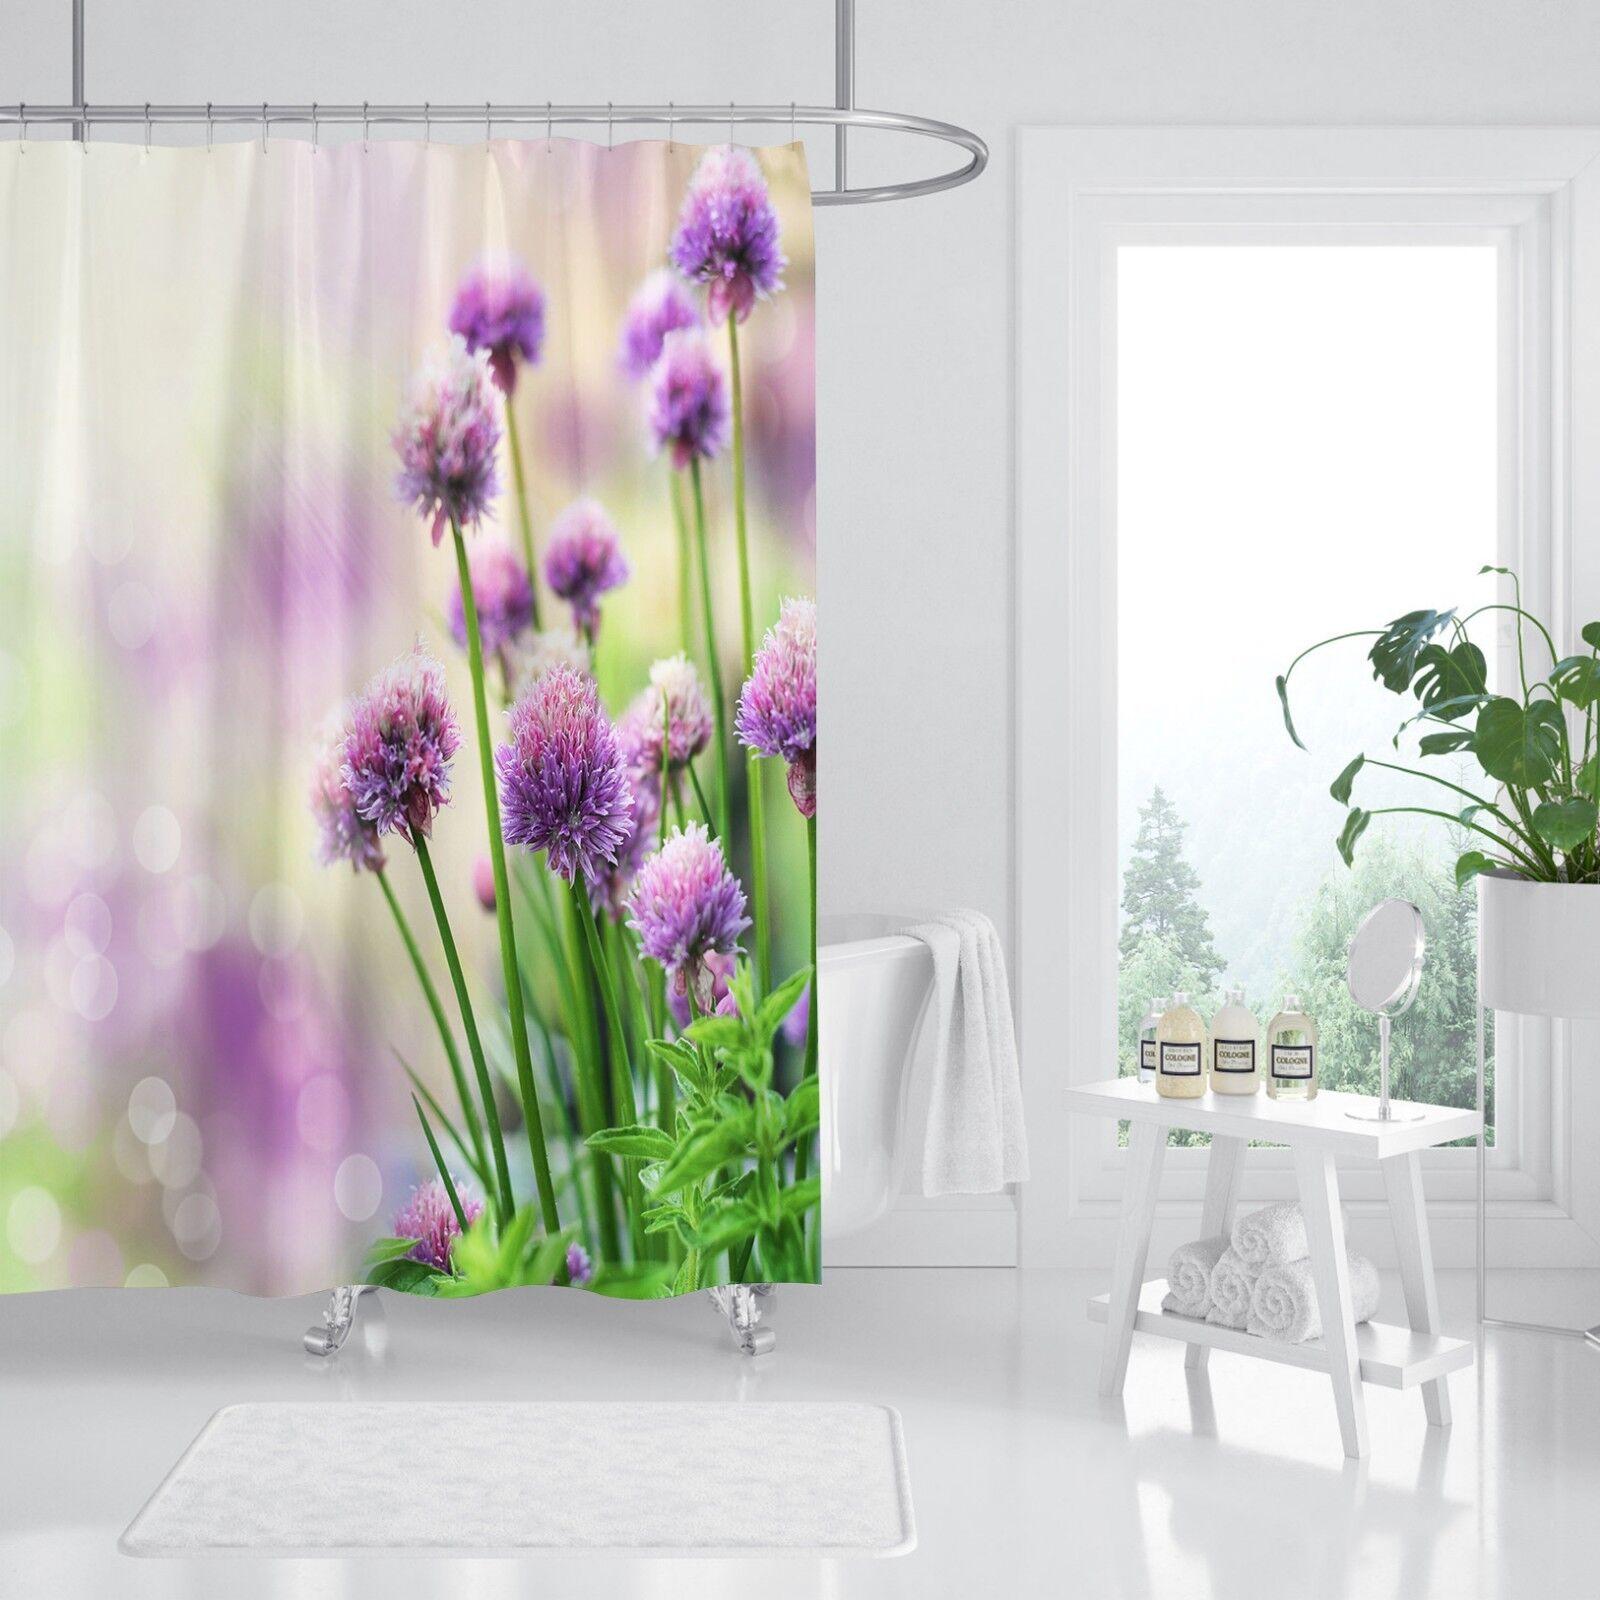 3D lila Flowers 45 Shower Curtain Waterproof Fiber Bathroom Windows Toilet